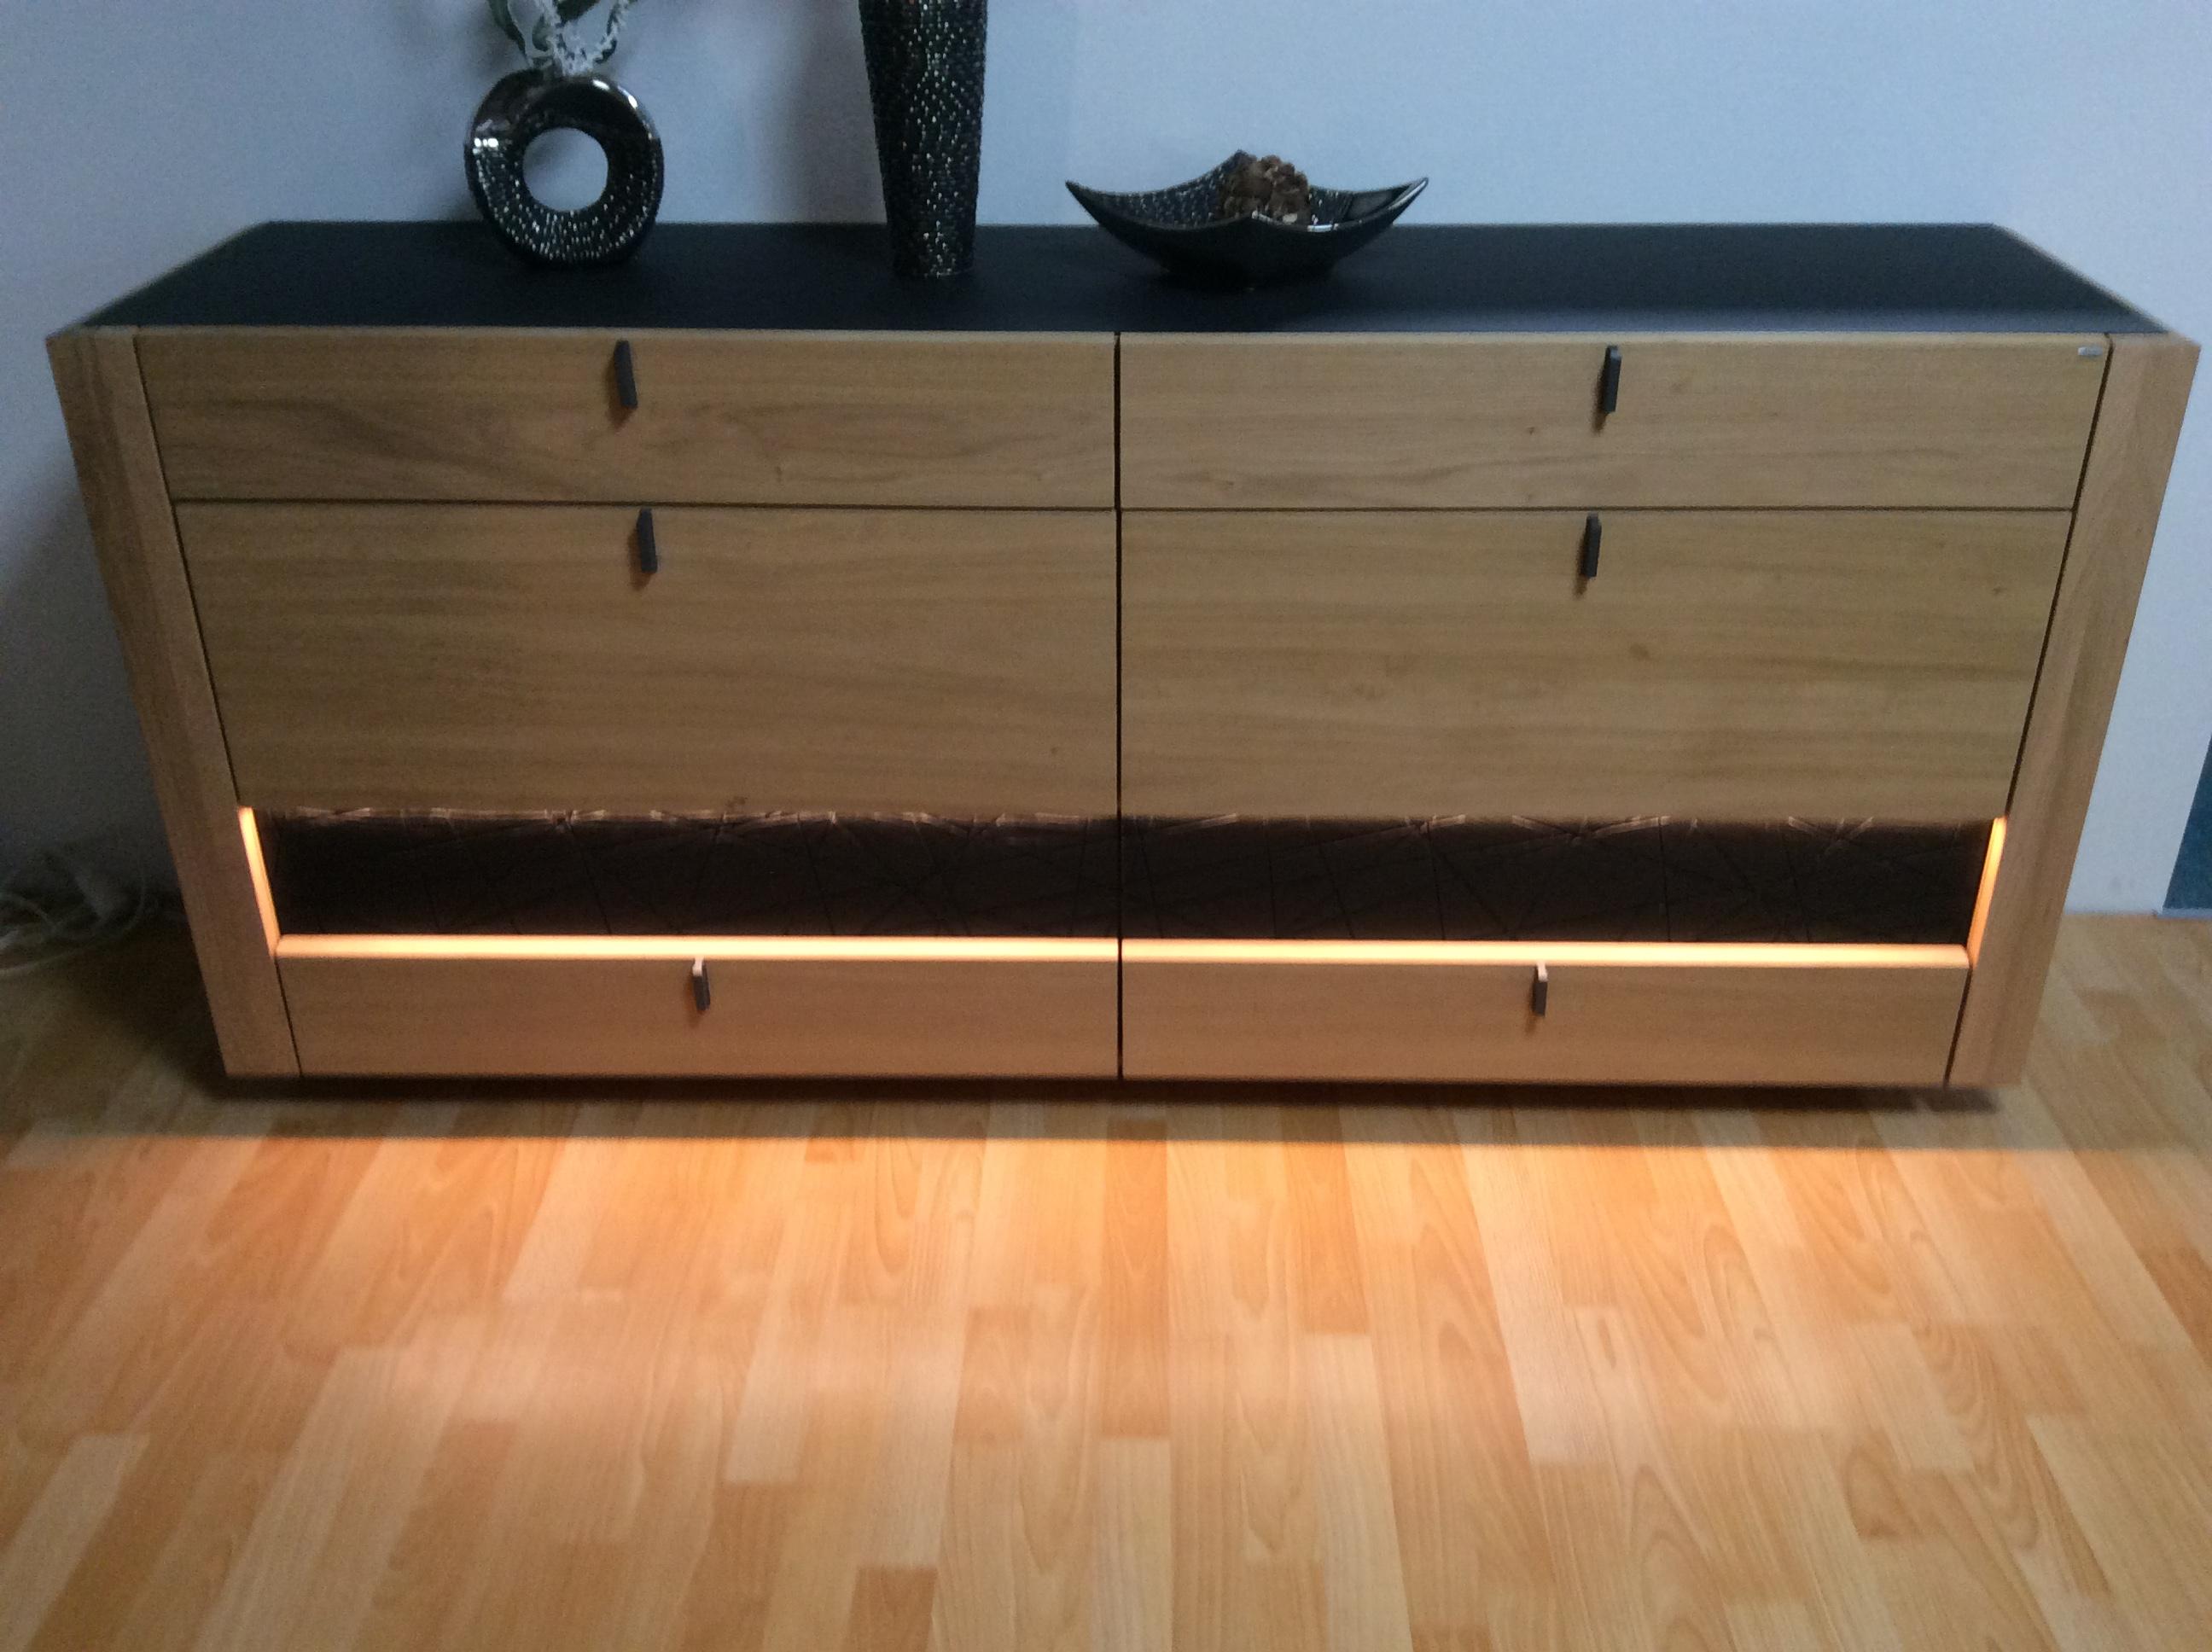 Sideboard 538002-002+021+022